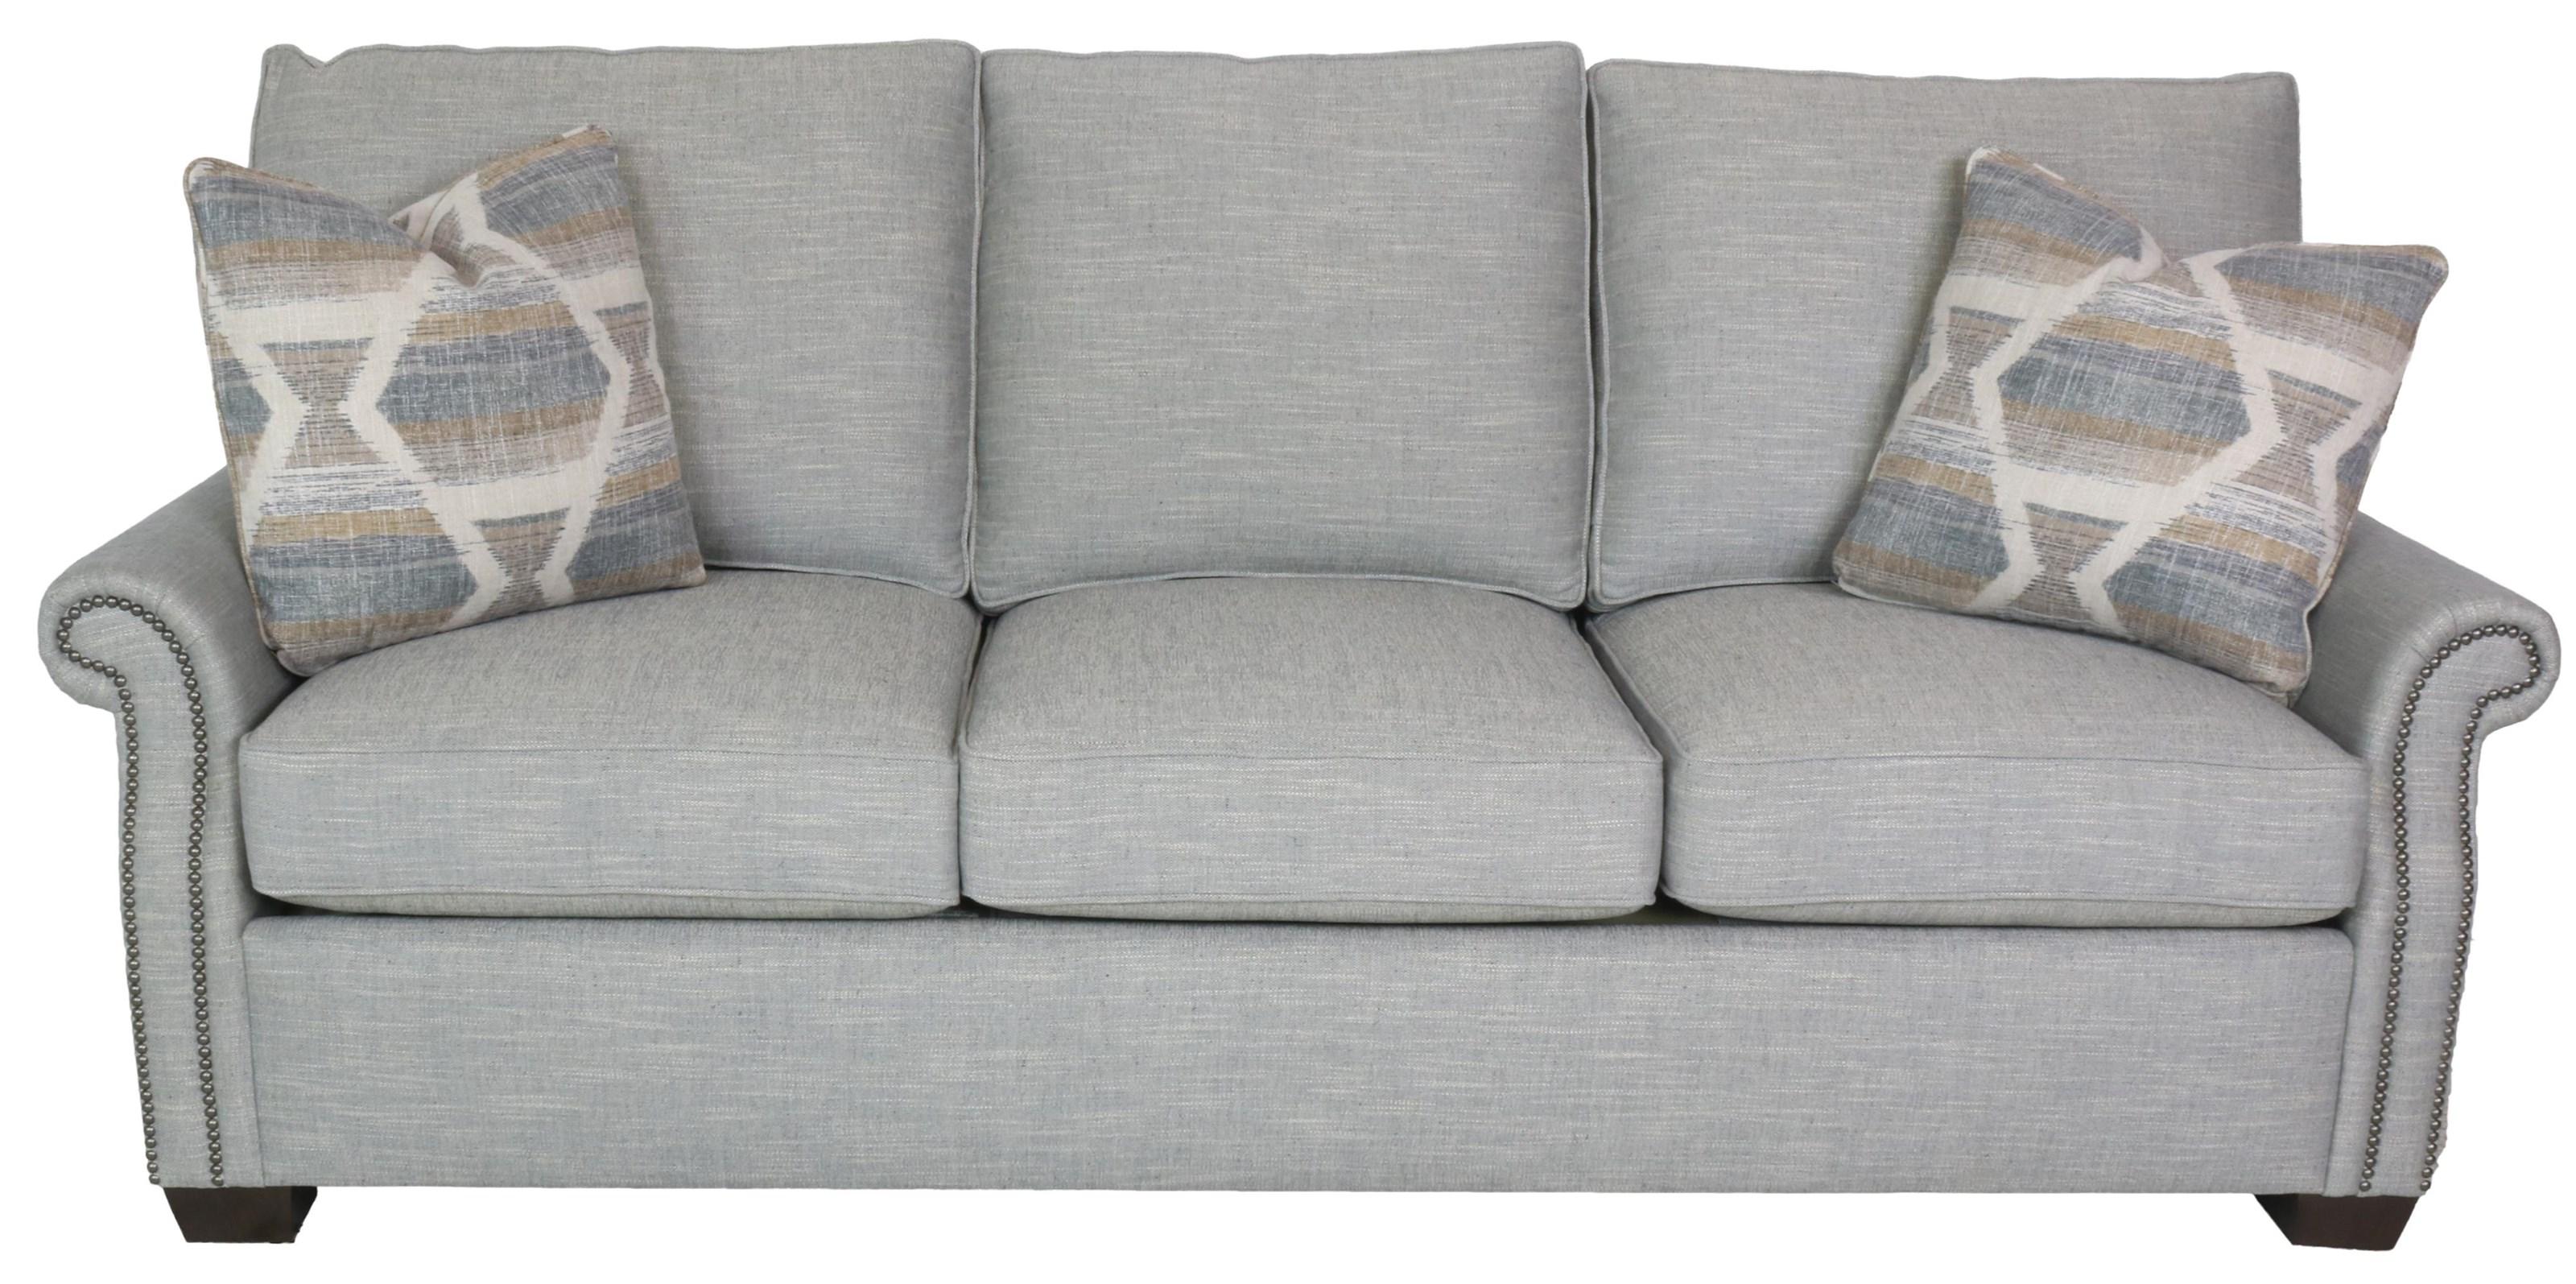 2800 Sofa by Geoffrey Alexander at Sprintz Furniture